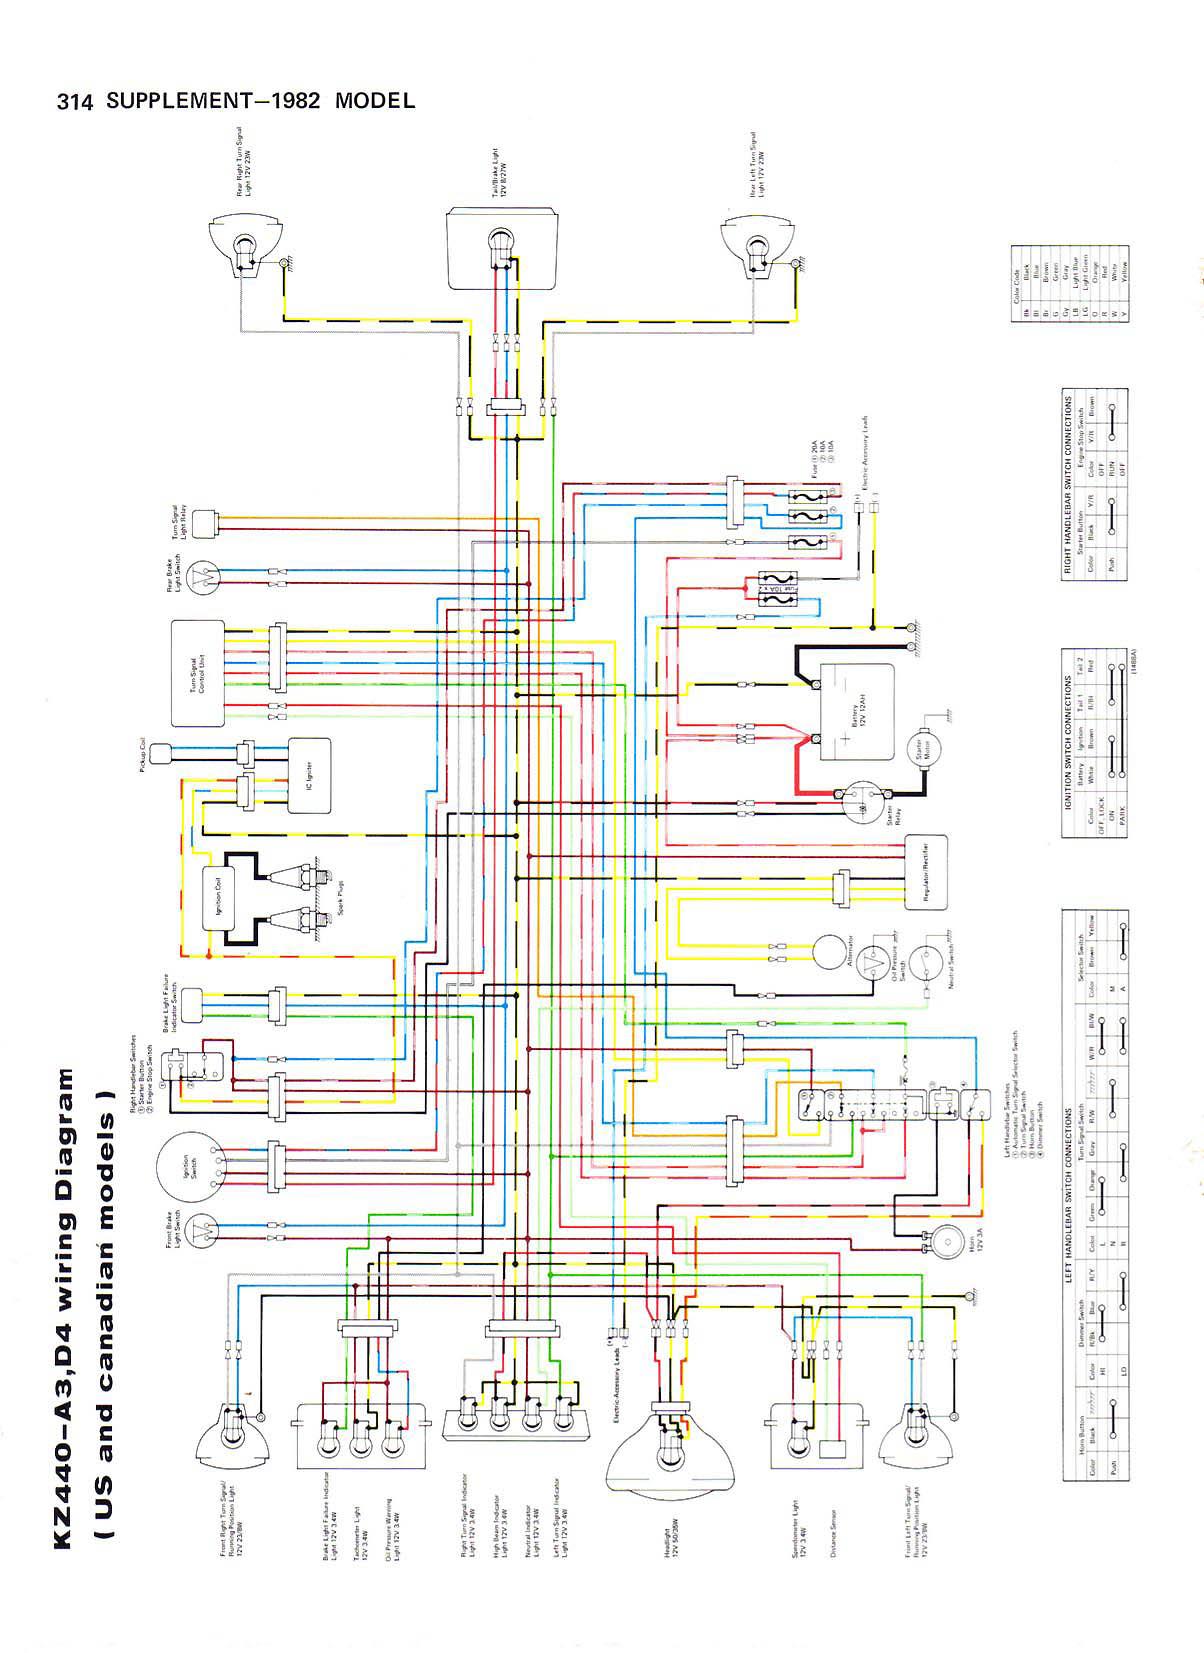 Kz400 Wiring Diagram Simplified Schematic Diagrams 1979 Kawasaki K Z 650 1977 Wire 1976 Attractive